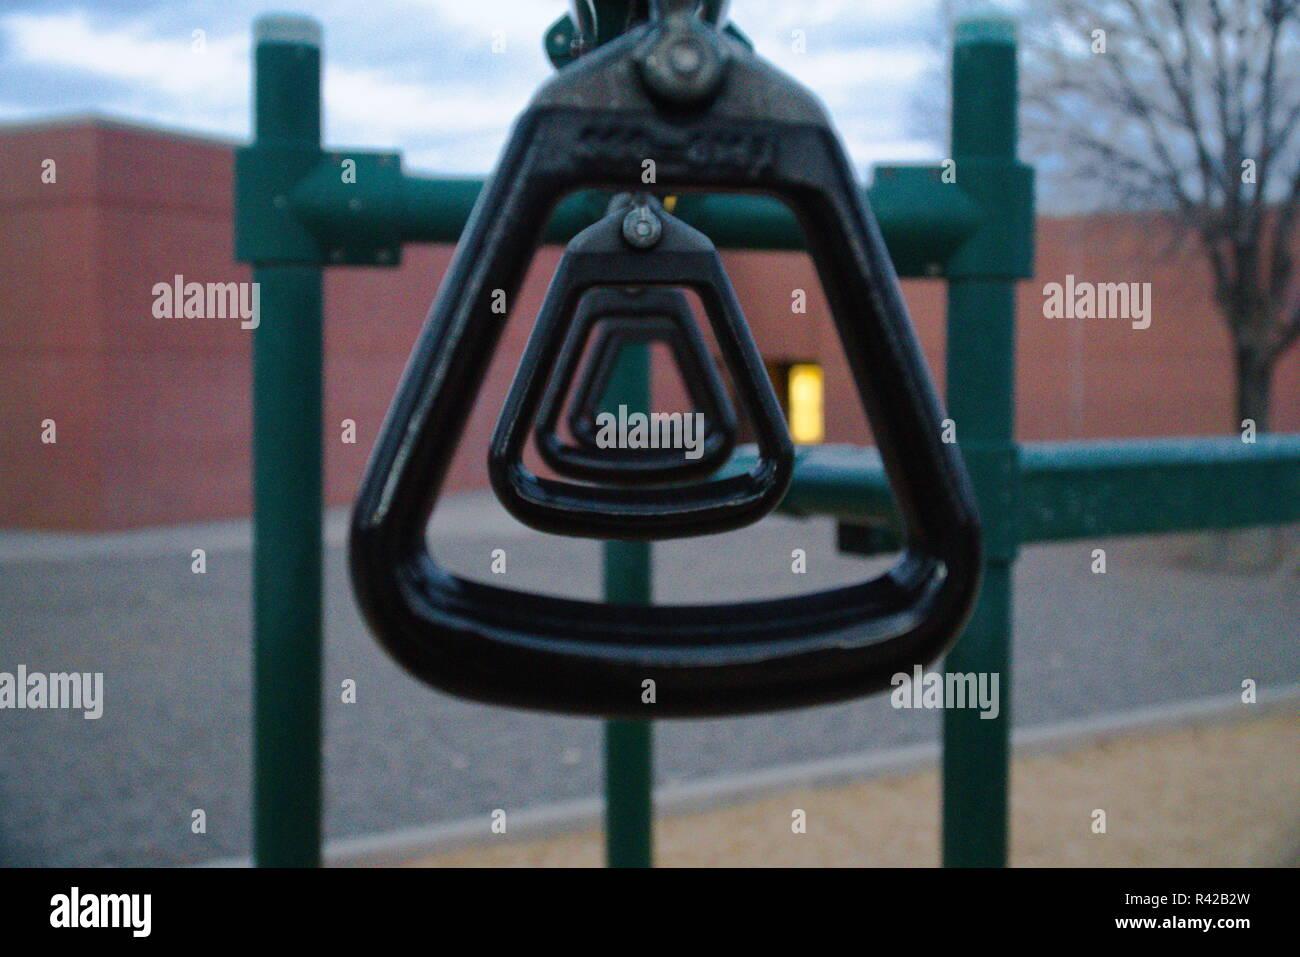 A shot of handlebars playground equipment at a park. - Stock Image